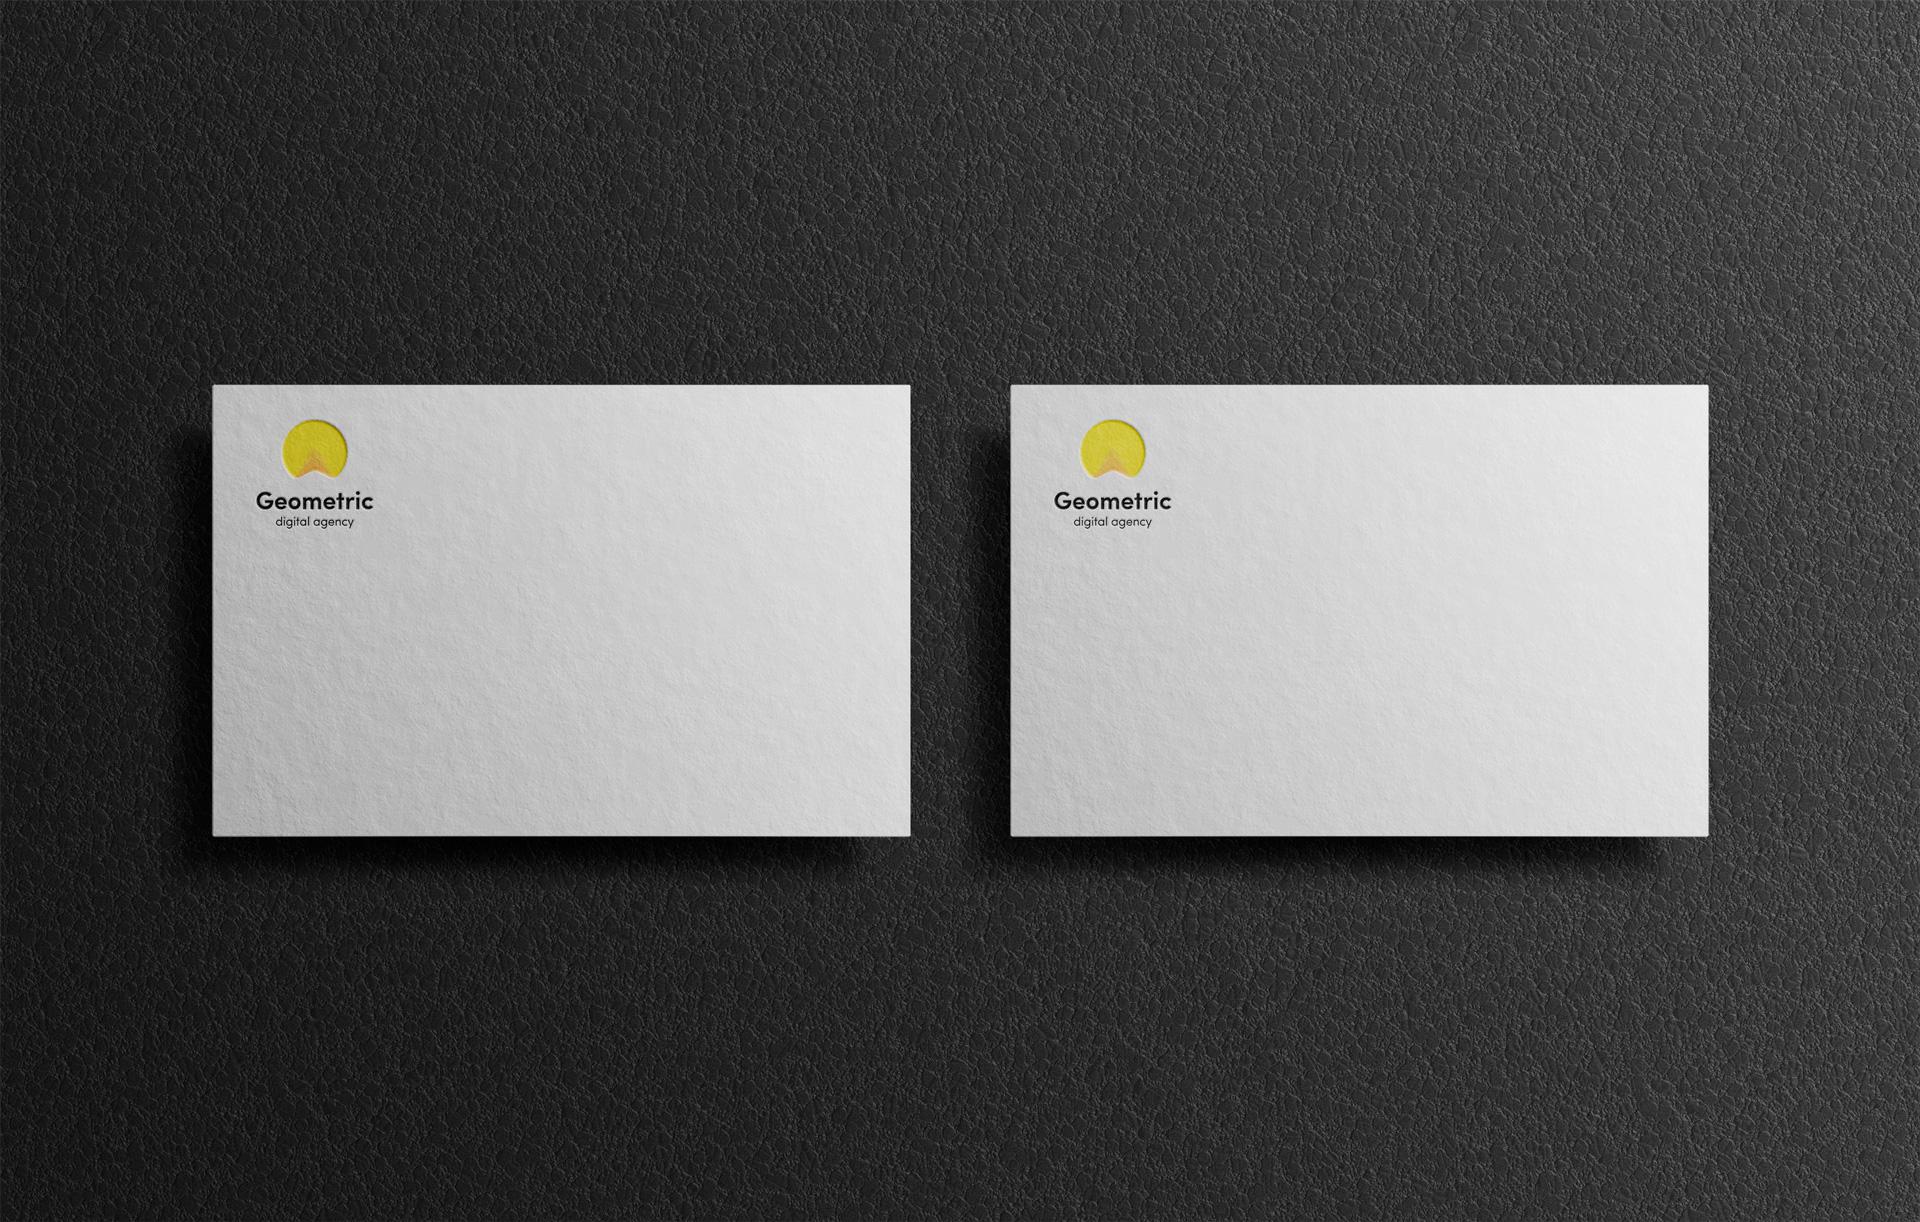 blank business card design mockup psd file free download - 1024×652